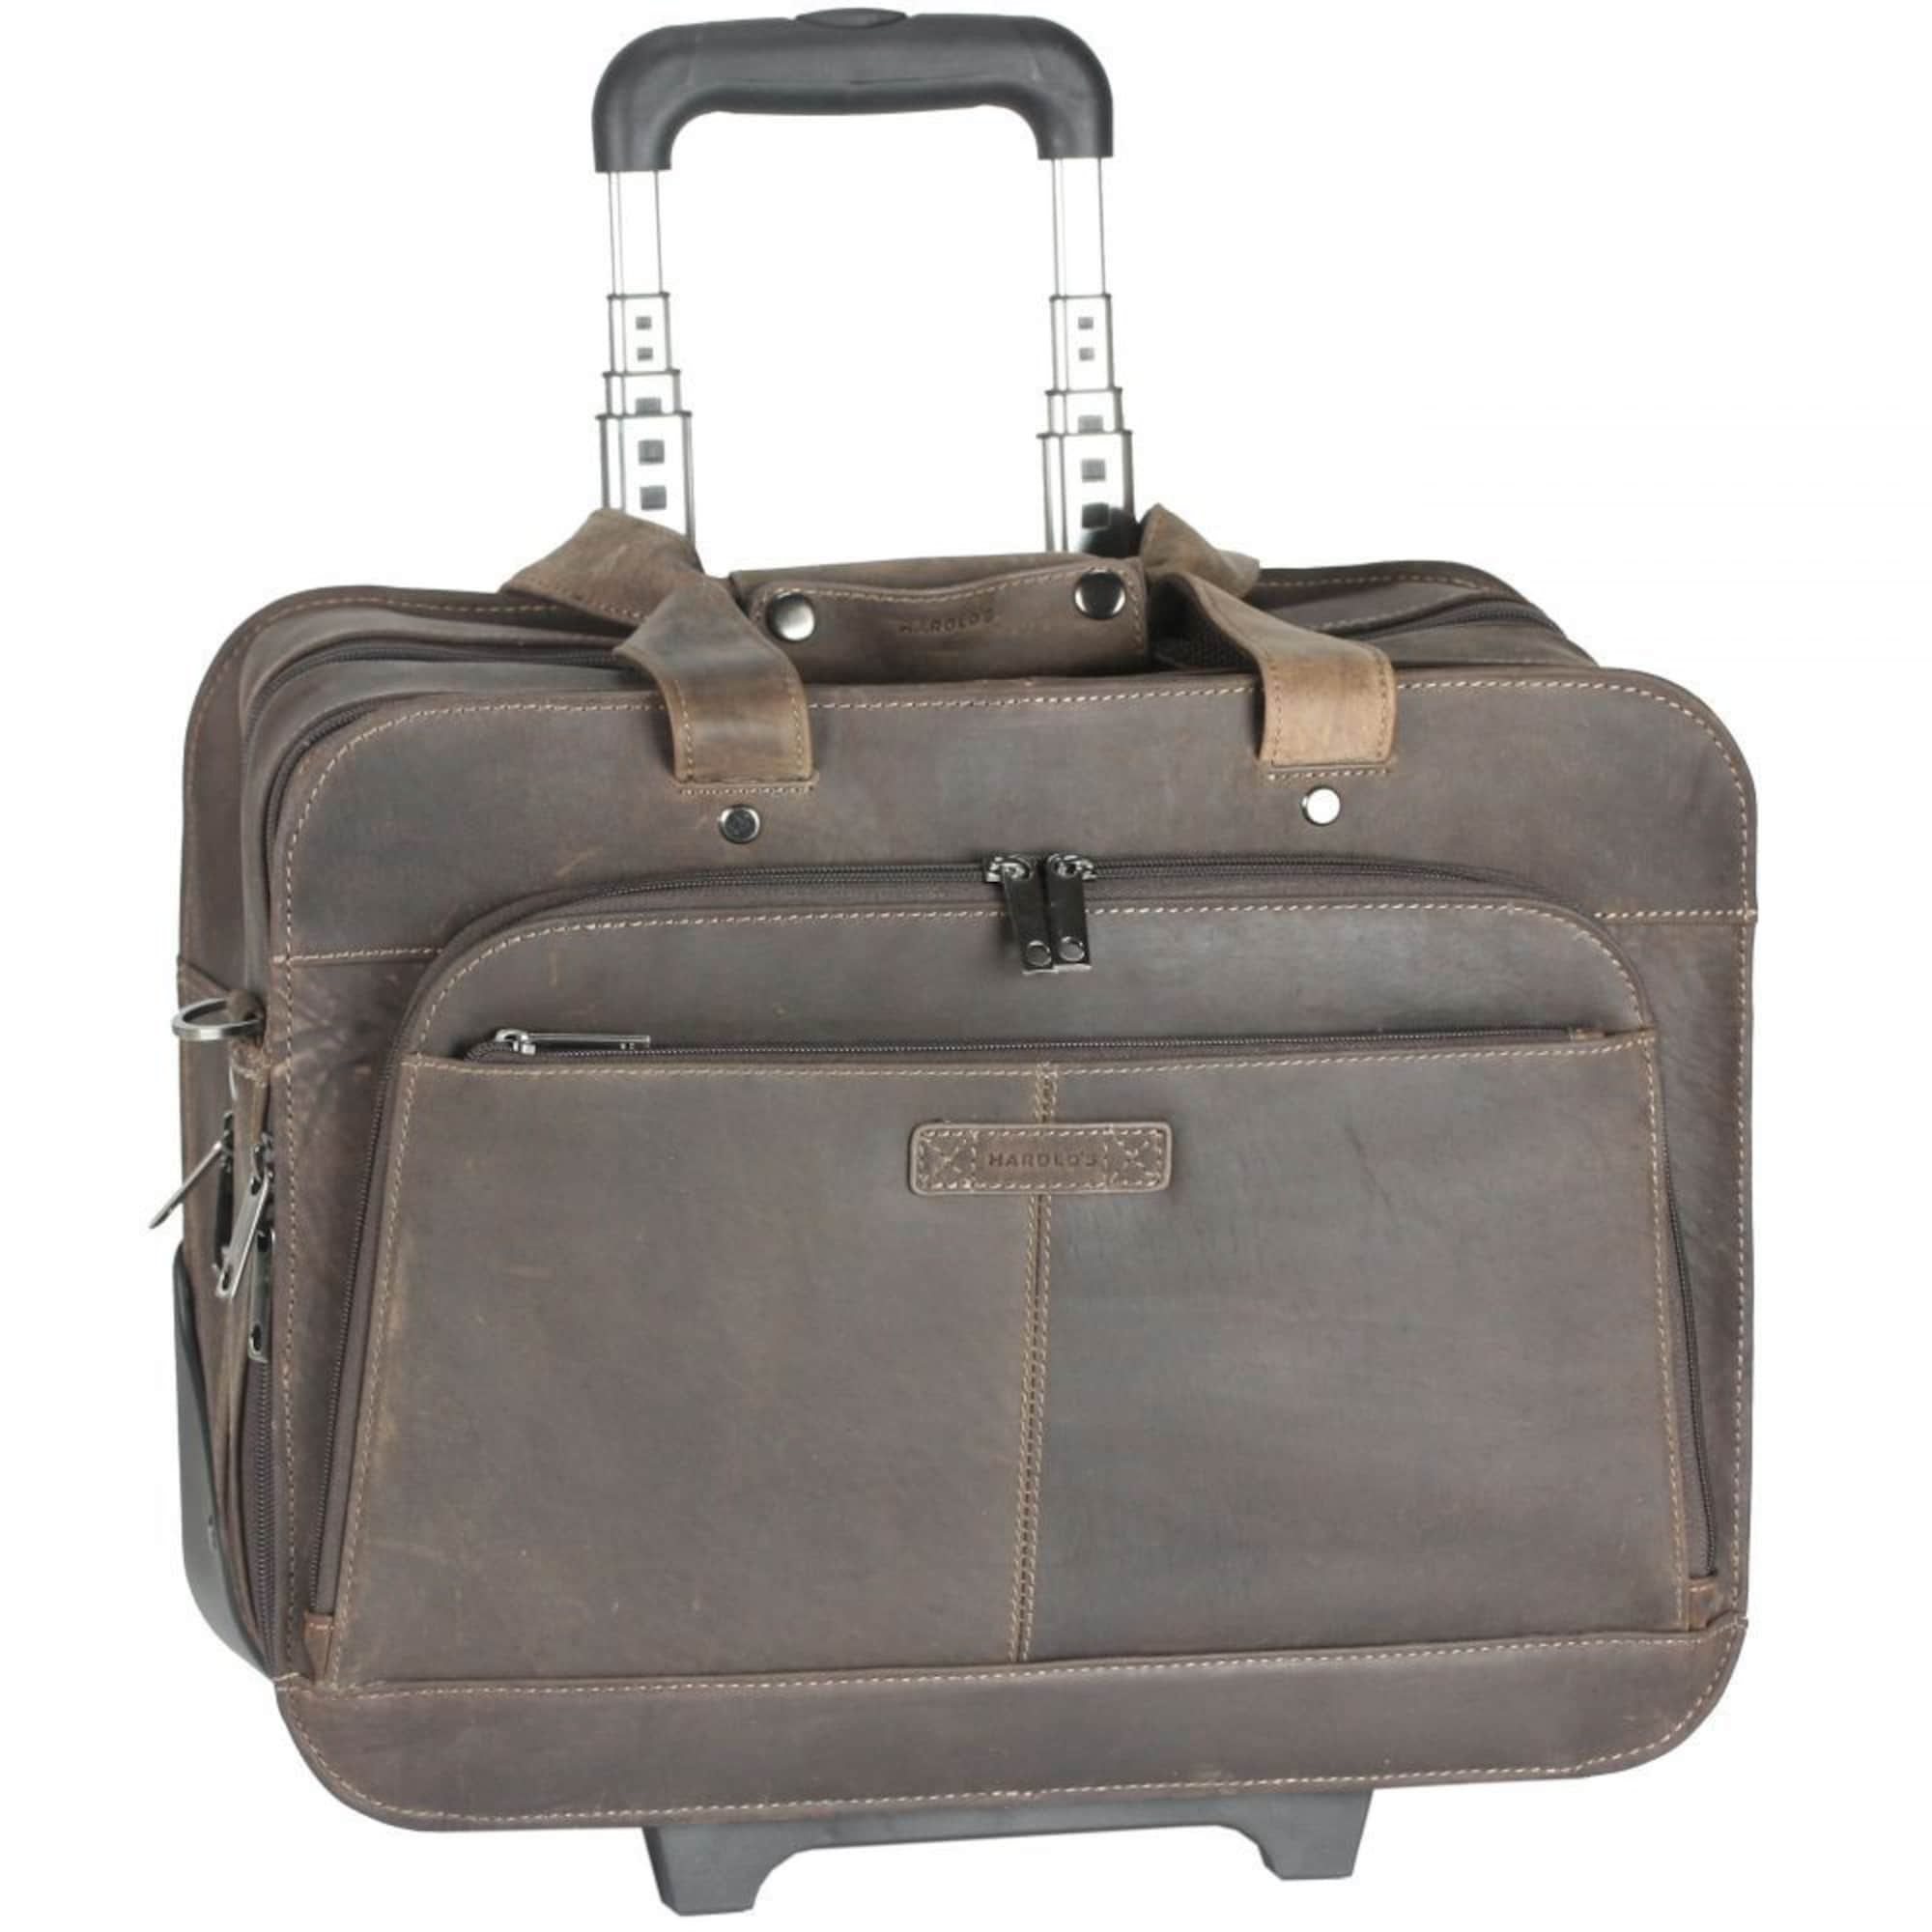 Trolley 'Antico' | Taschen > Koffer & Trolleys > Trolleys | Taupe | Harolds